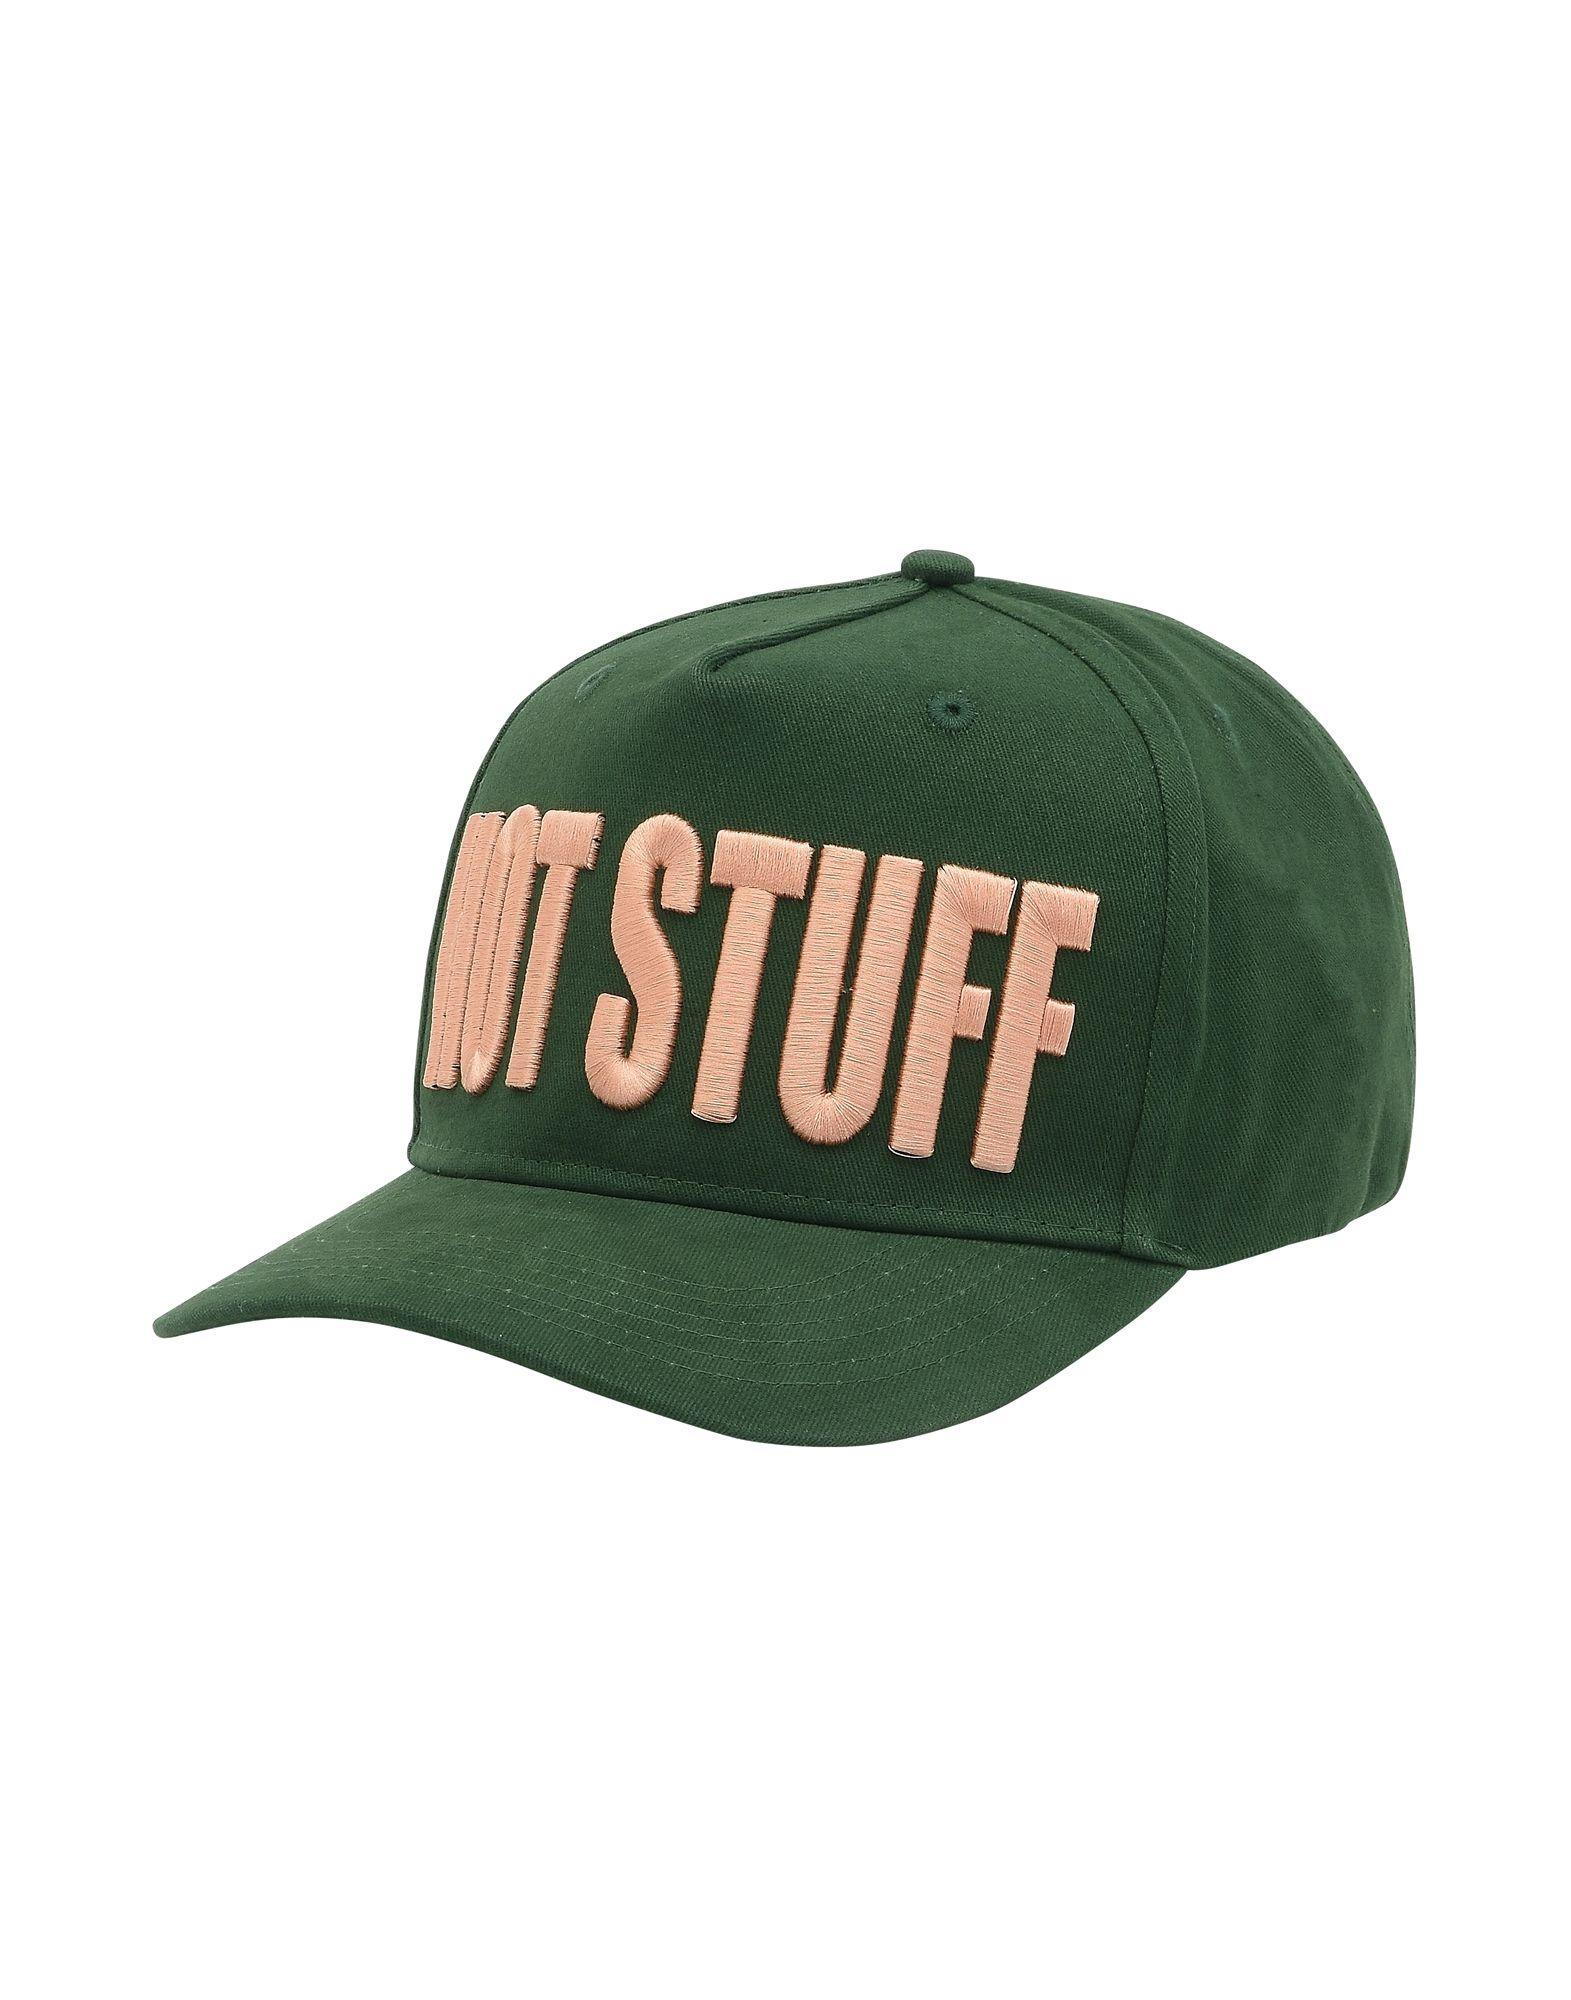 Essentiel Antwerp Hat In Green